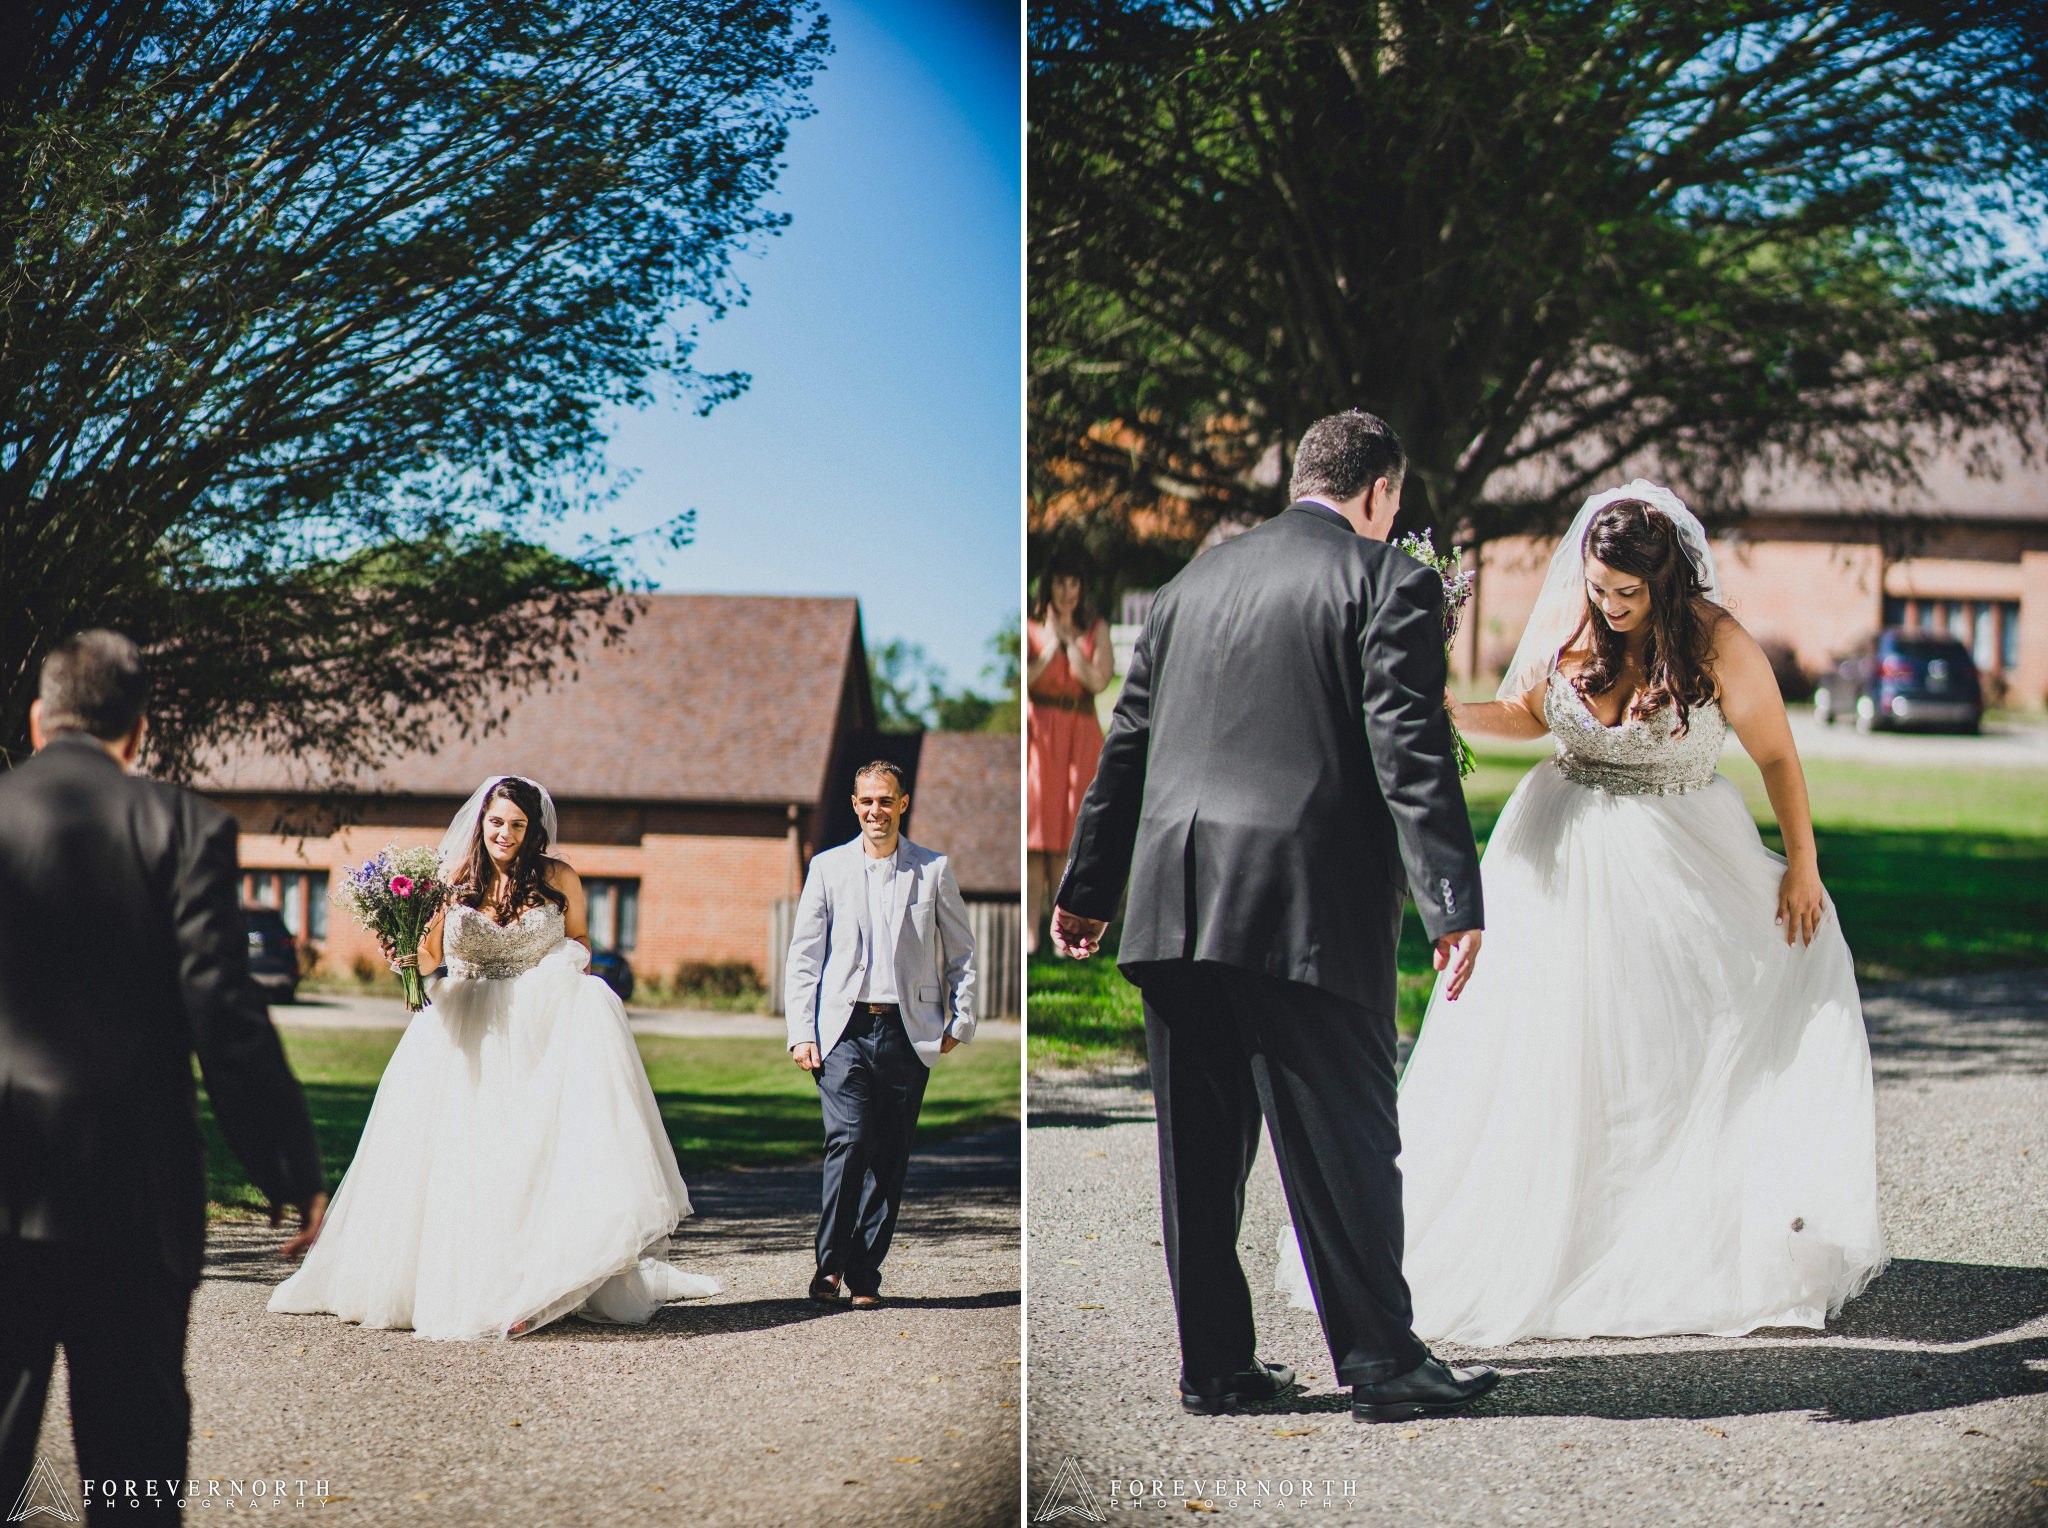 Brown-Allaire-State-Park-Wedding-Photographer-48.JPG